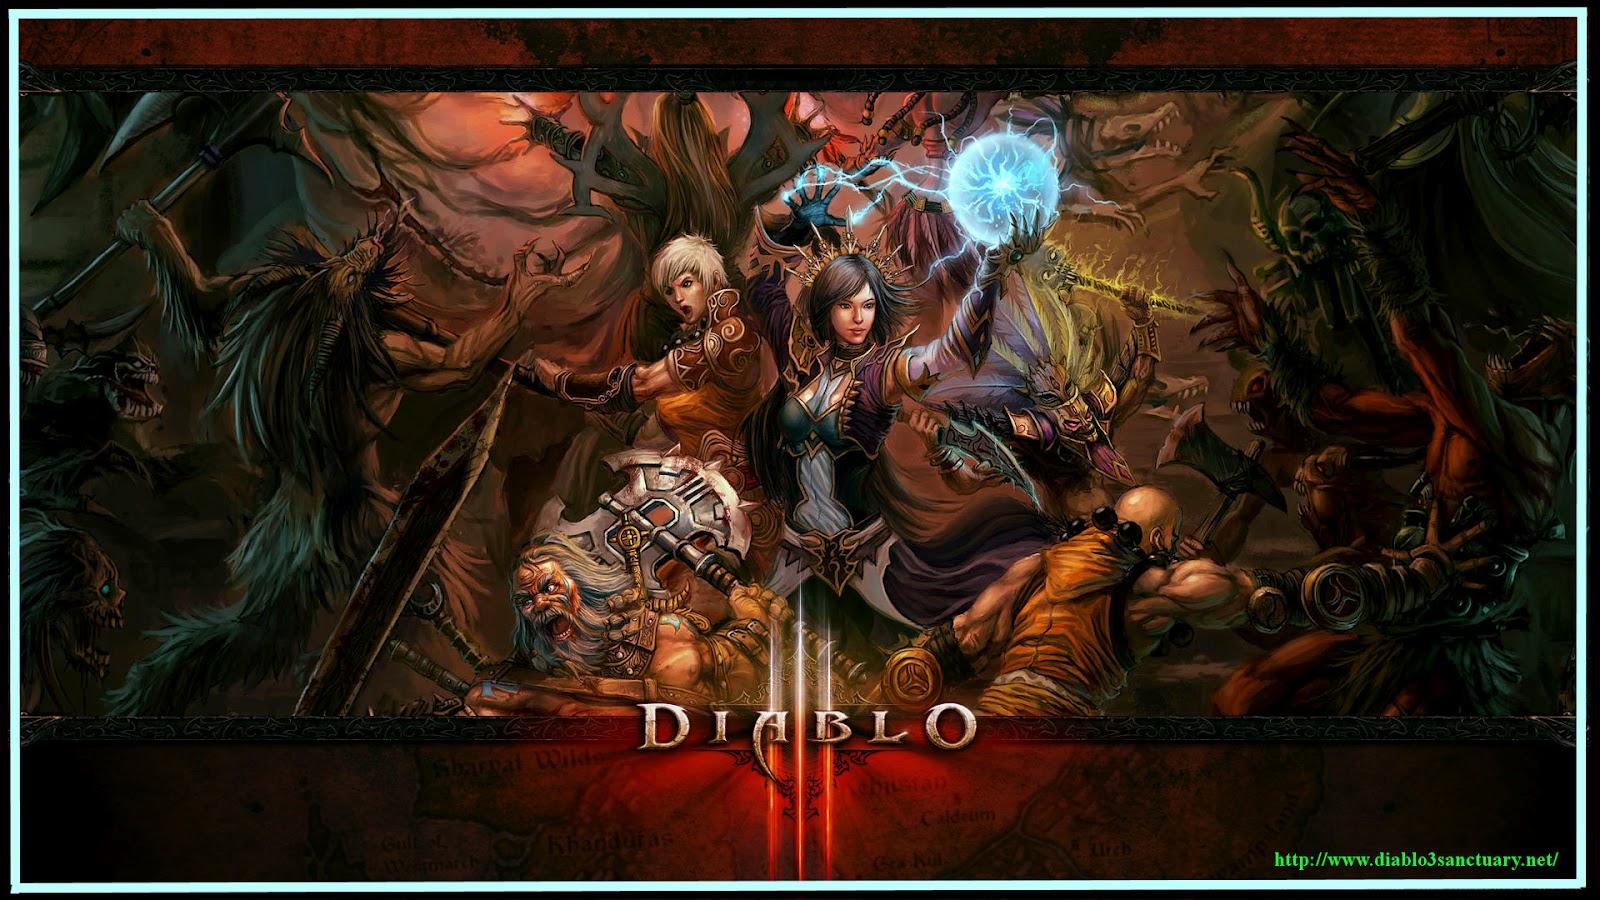 http://2.bp.blogspot.com/-p37K4vk2YxA/T6d5UzmUnOI/AAAAAAAAAJ0/gRmF3AEyFVk/s1600/Diablo-3-Wallpaper-Battle-All-Characters-Classes-WideScreen-1920x1200-1920x1080.jpg